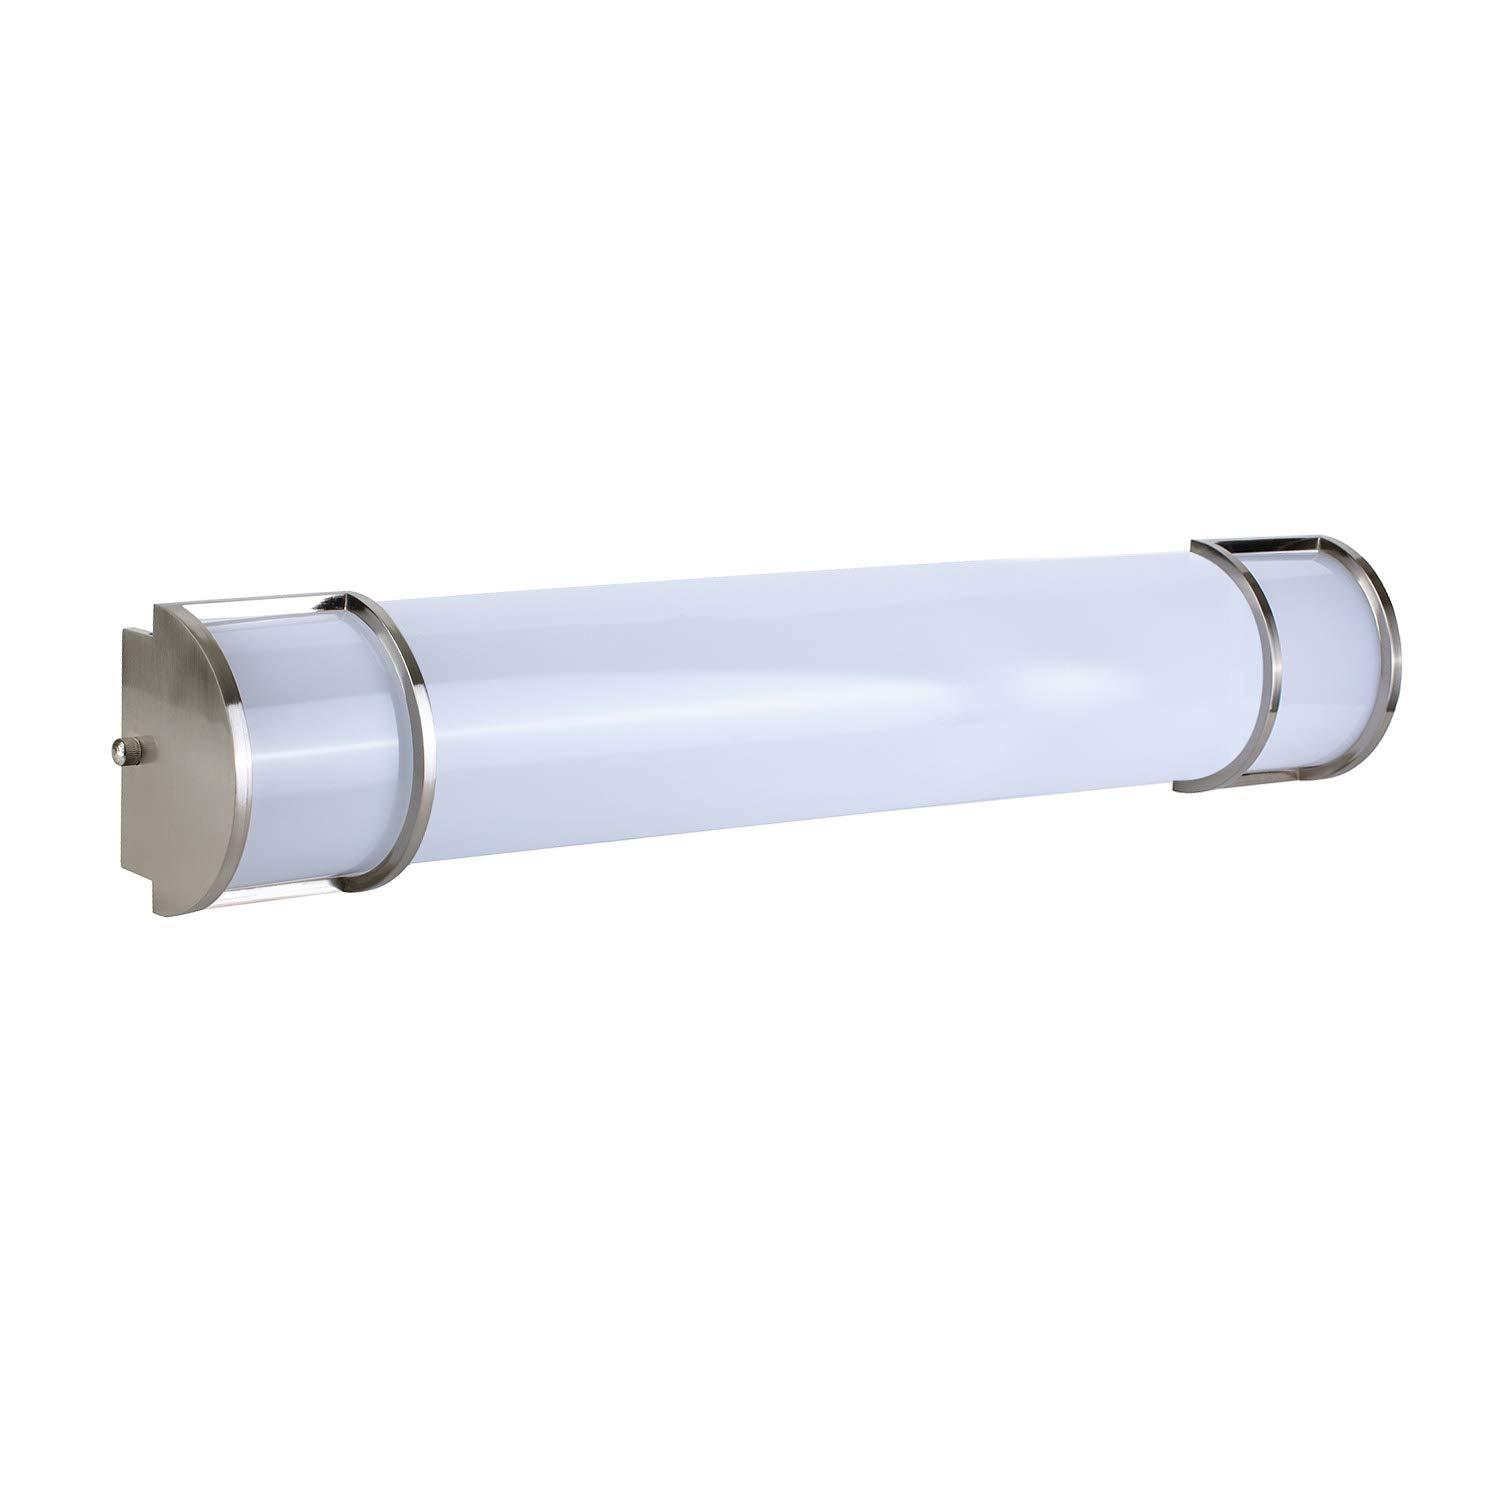 OSTWIN 24 Inch Dimmable LED Linear Bath Vanity Light Bar, Modern Bathroom Vanity Light Fixture 25W 5000K Daylight, Vertical or Horizontal Tube, Brushed Nickel Finish, ETL&Energy Star Listed